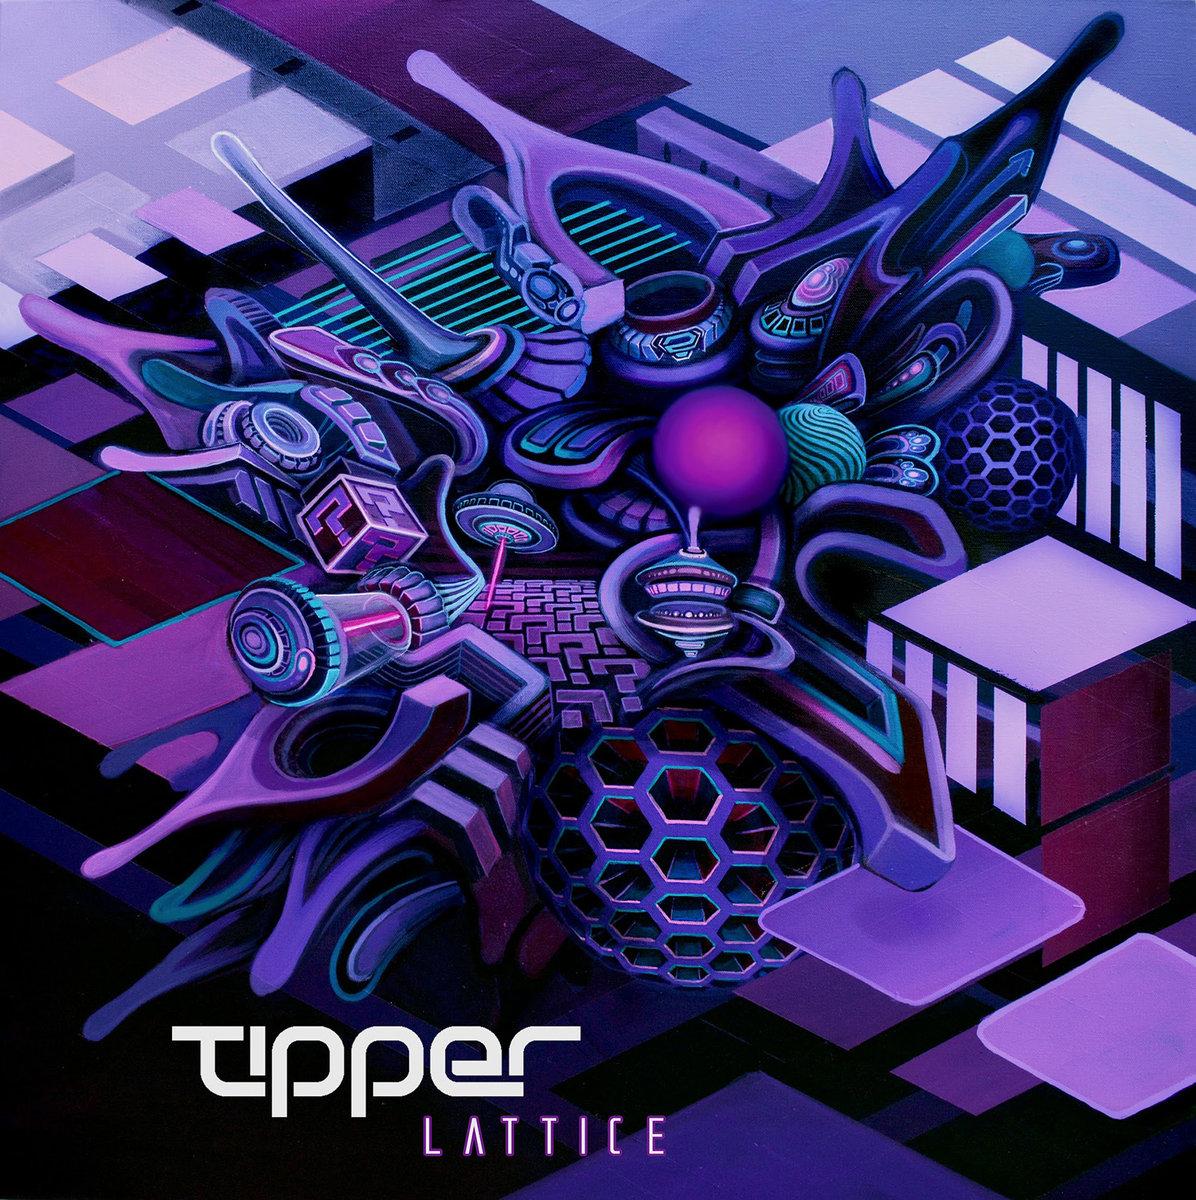 lattice - tipper.jpg